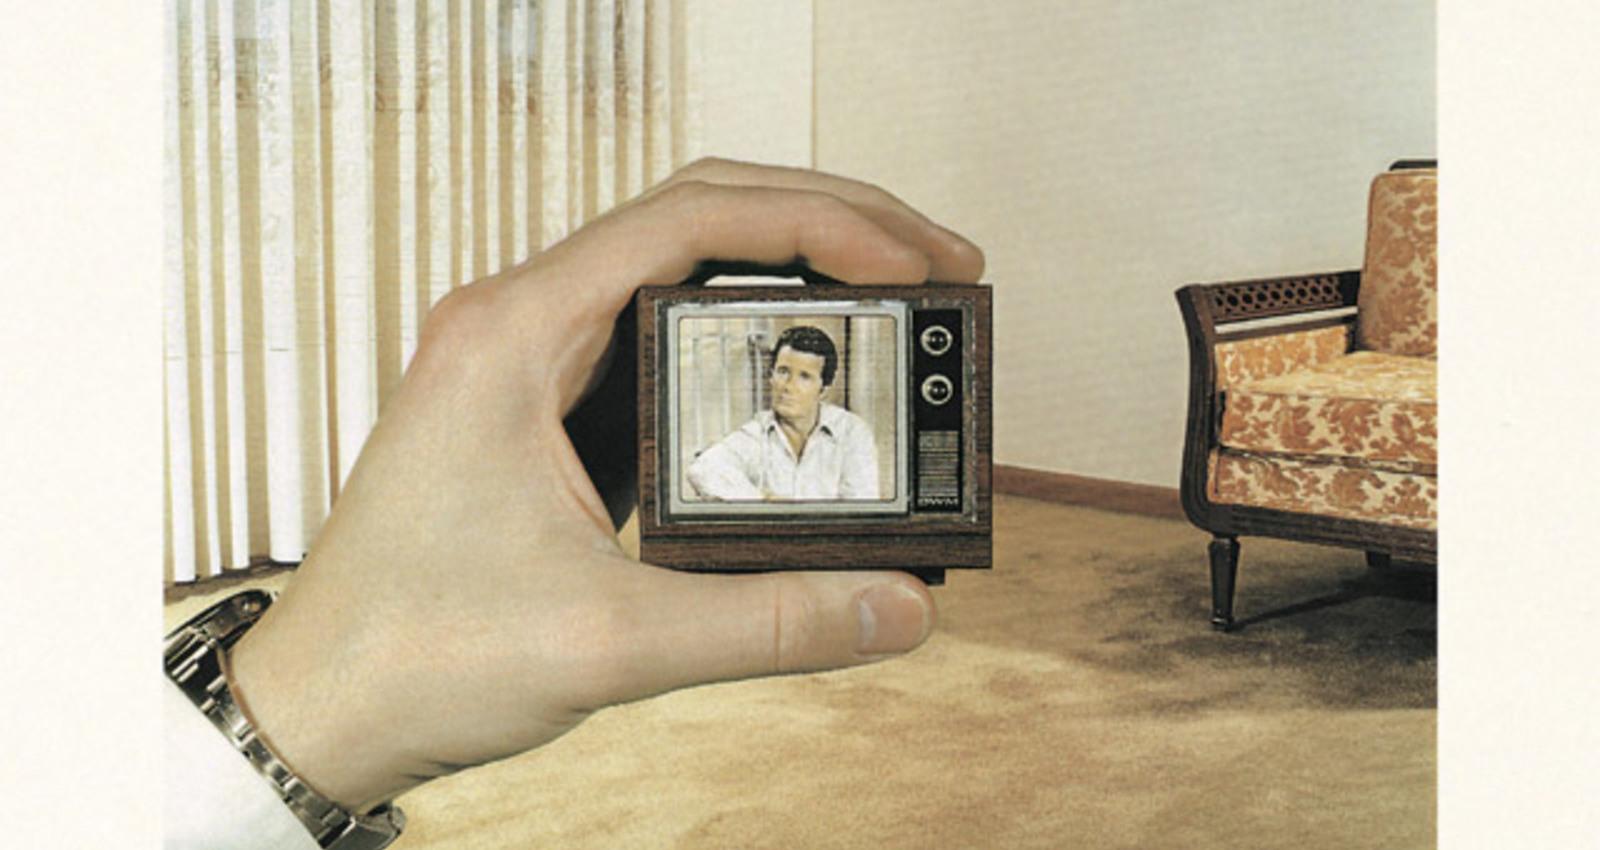 Fridge, Television, Chair